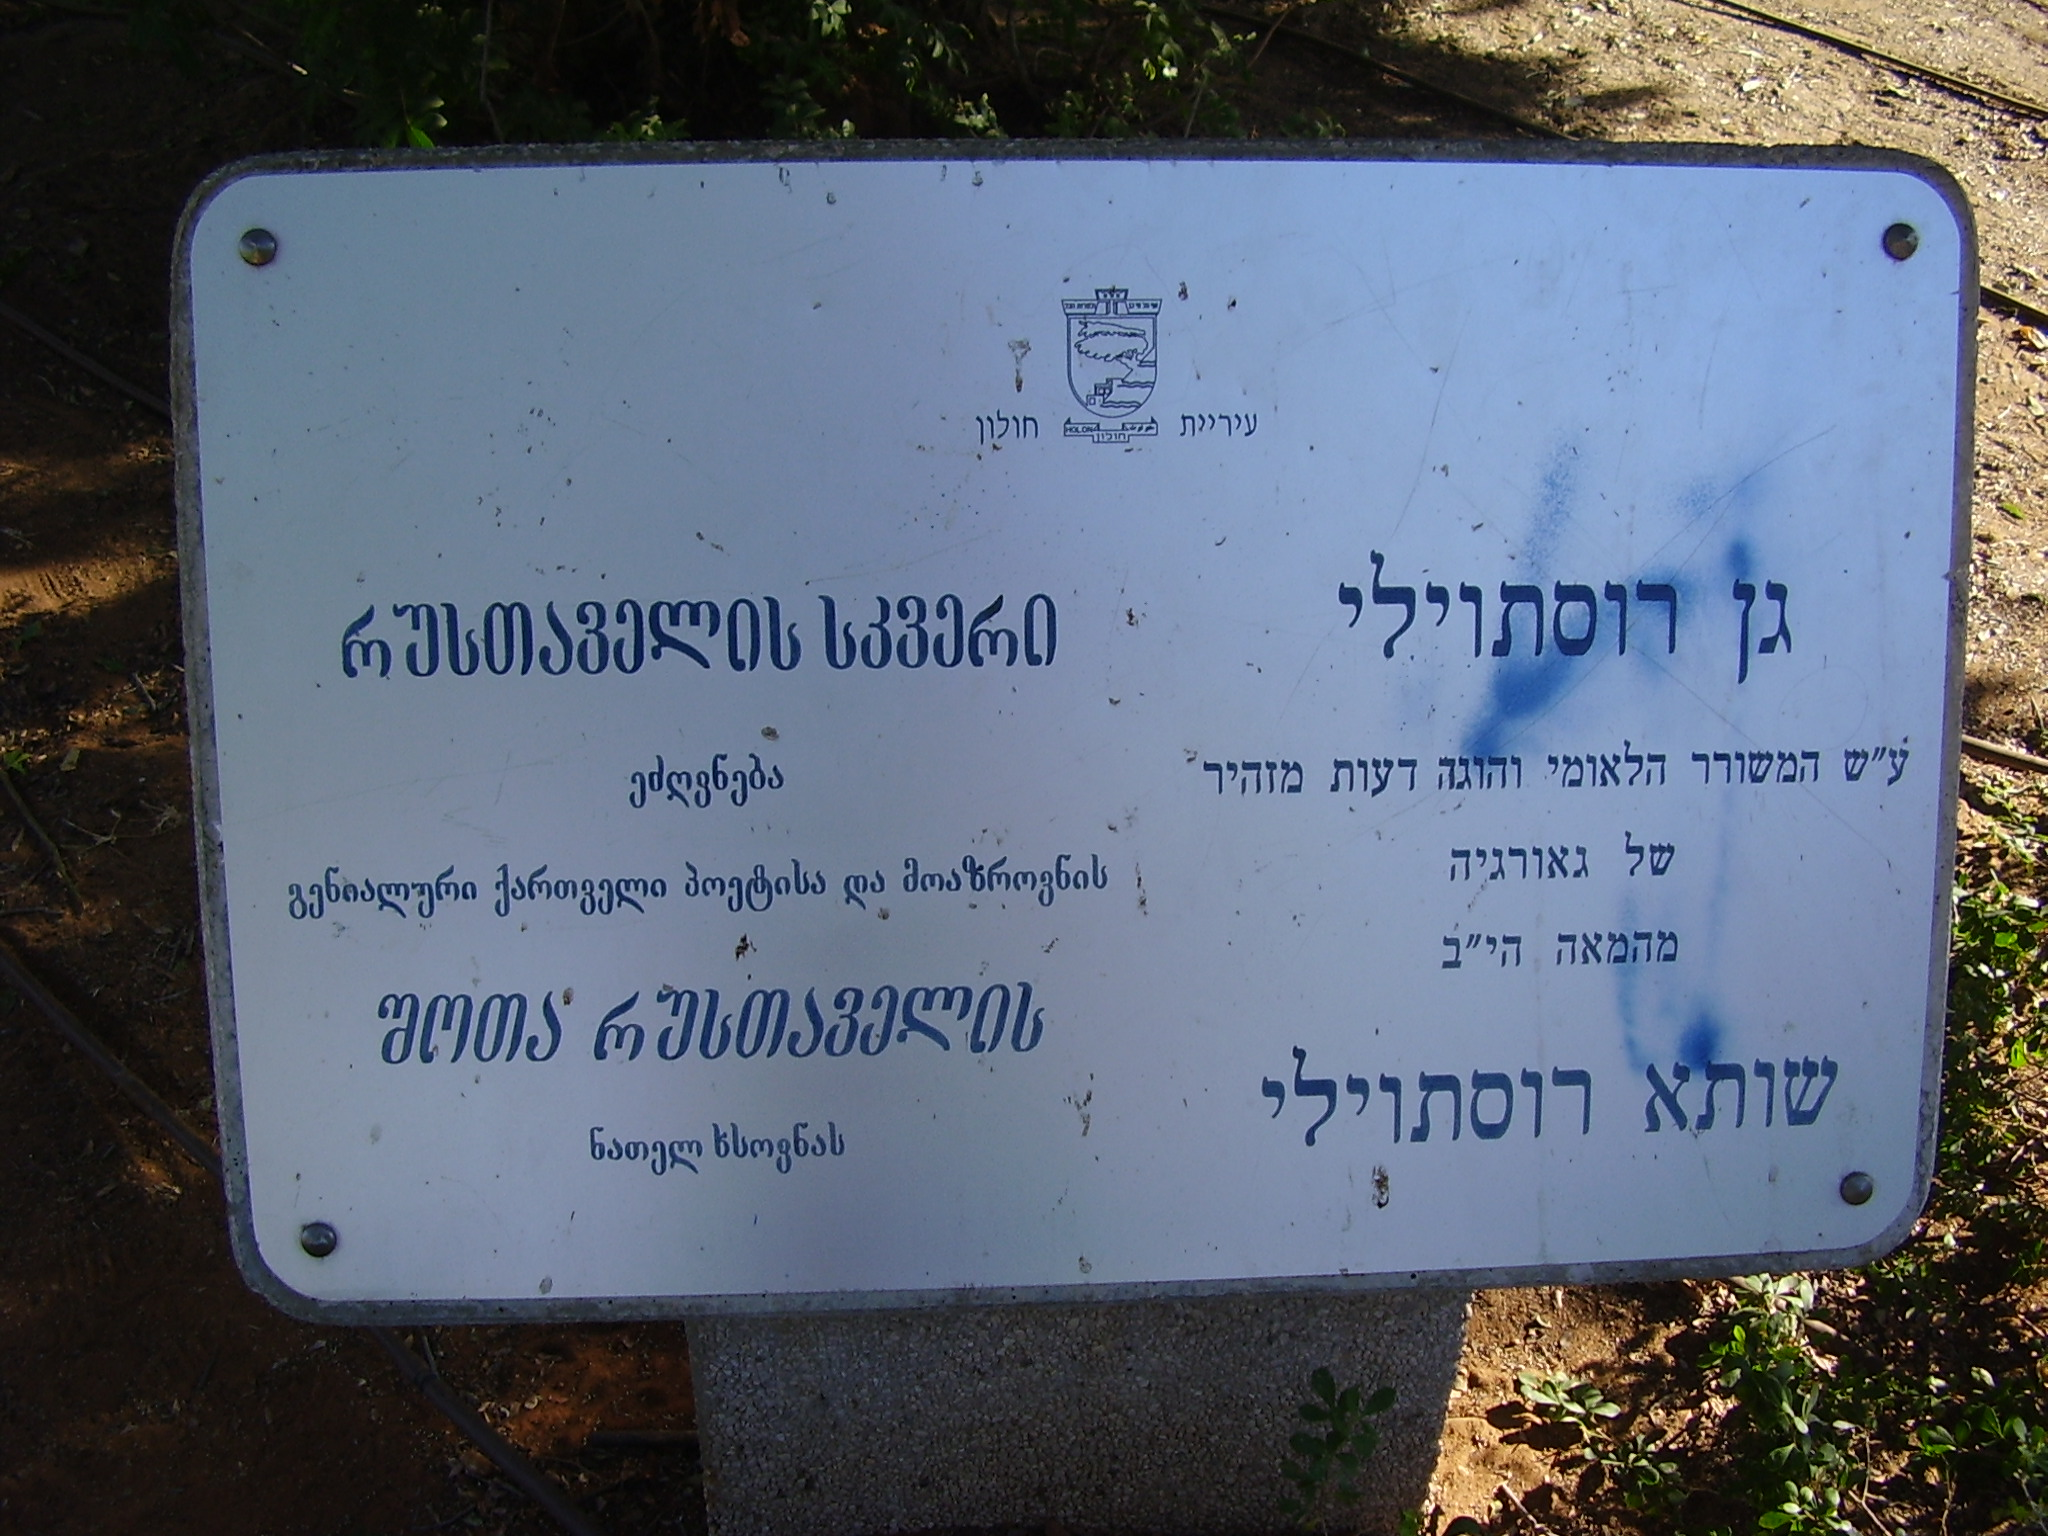 Shota Rustaveli garden in Holon, Israel.